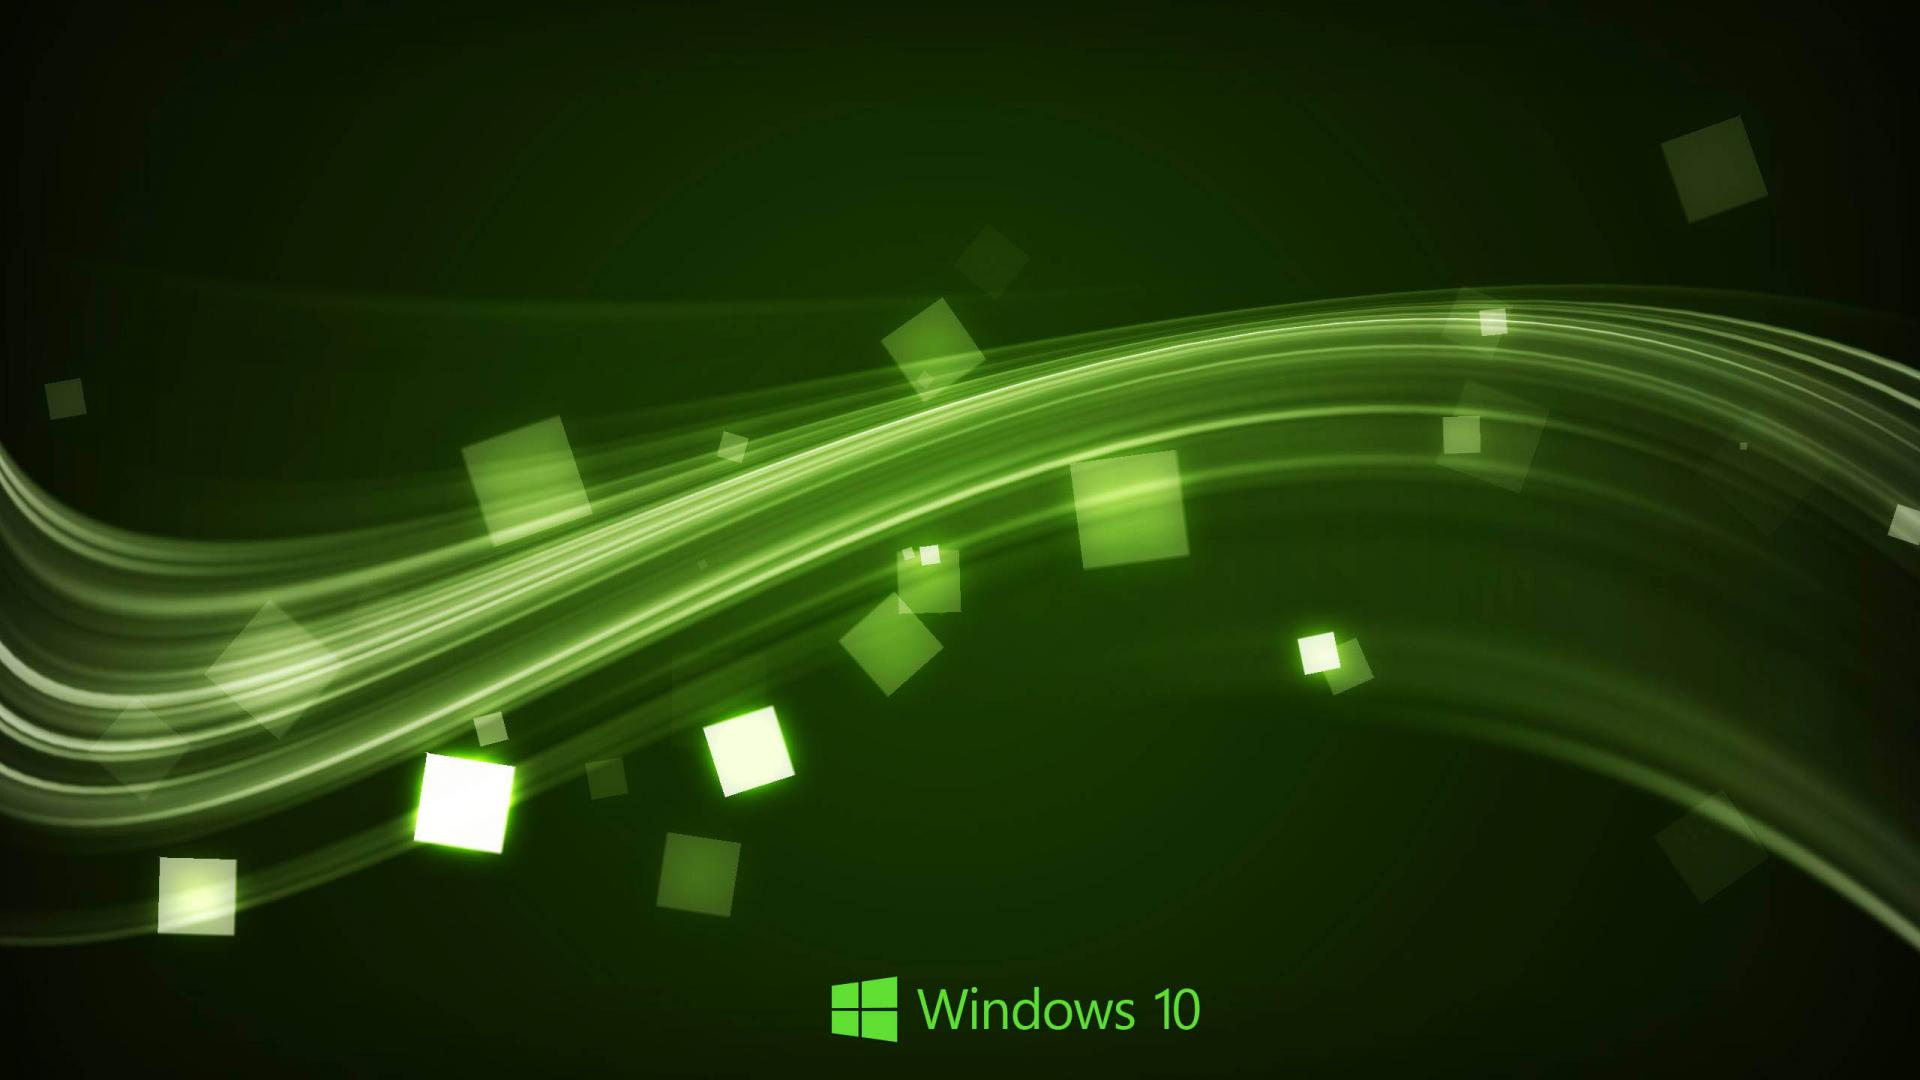 Windows Desktop Images Hp Backgrounds Windows 10